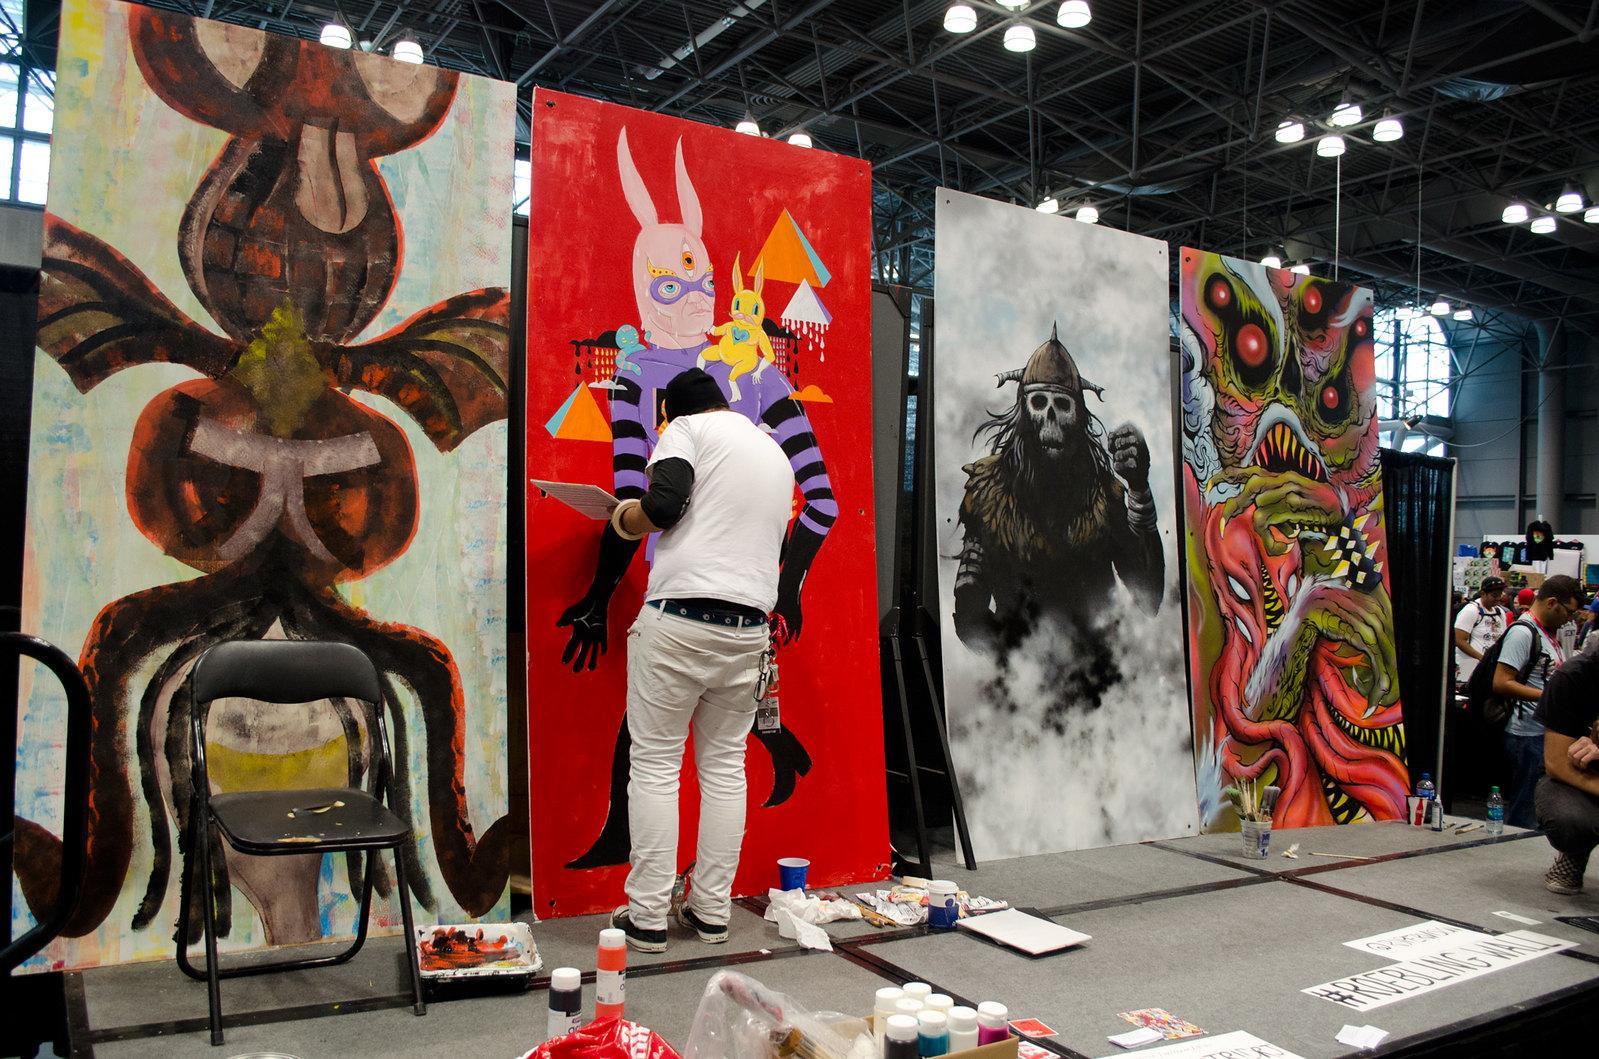 NYCC art